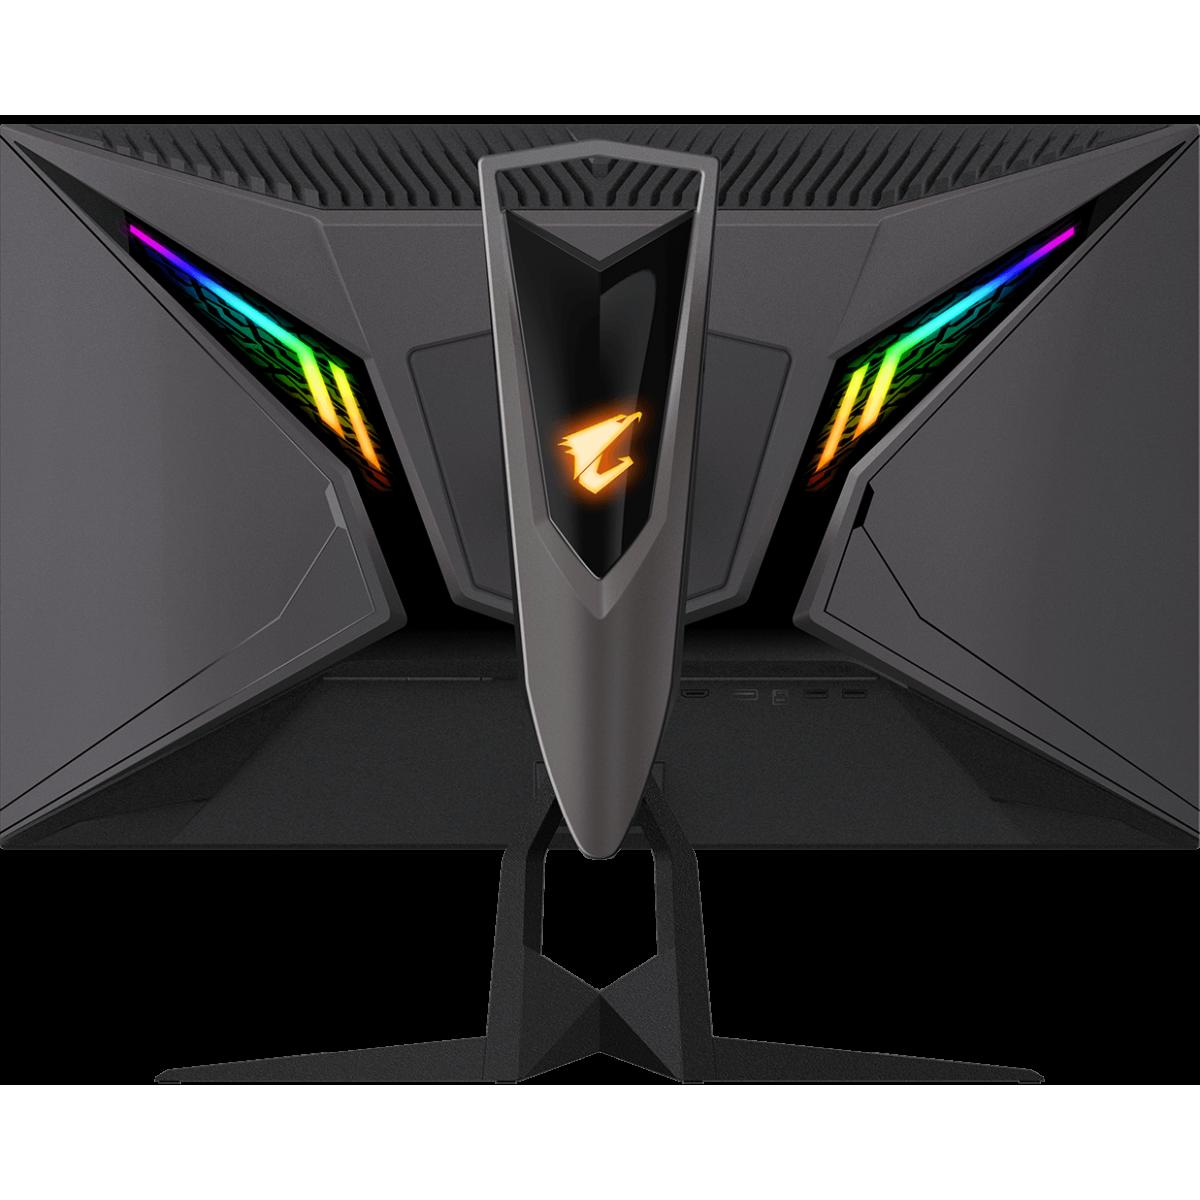 Monitor Gamer Gigabyte Aorus FI27Q, 27 Pol, QuadHD, 165Hz, 1ms, IPS, FreeSync, HDR, DP/HDMIx2, 20VM0-AFI27QBA-1SAR